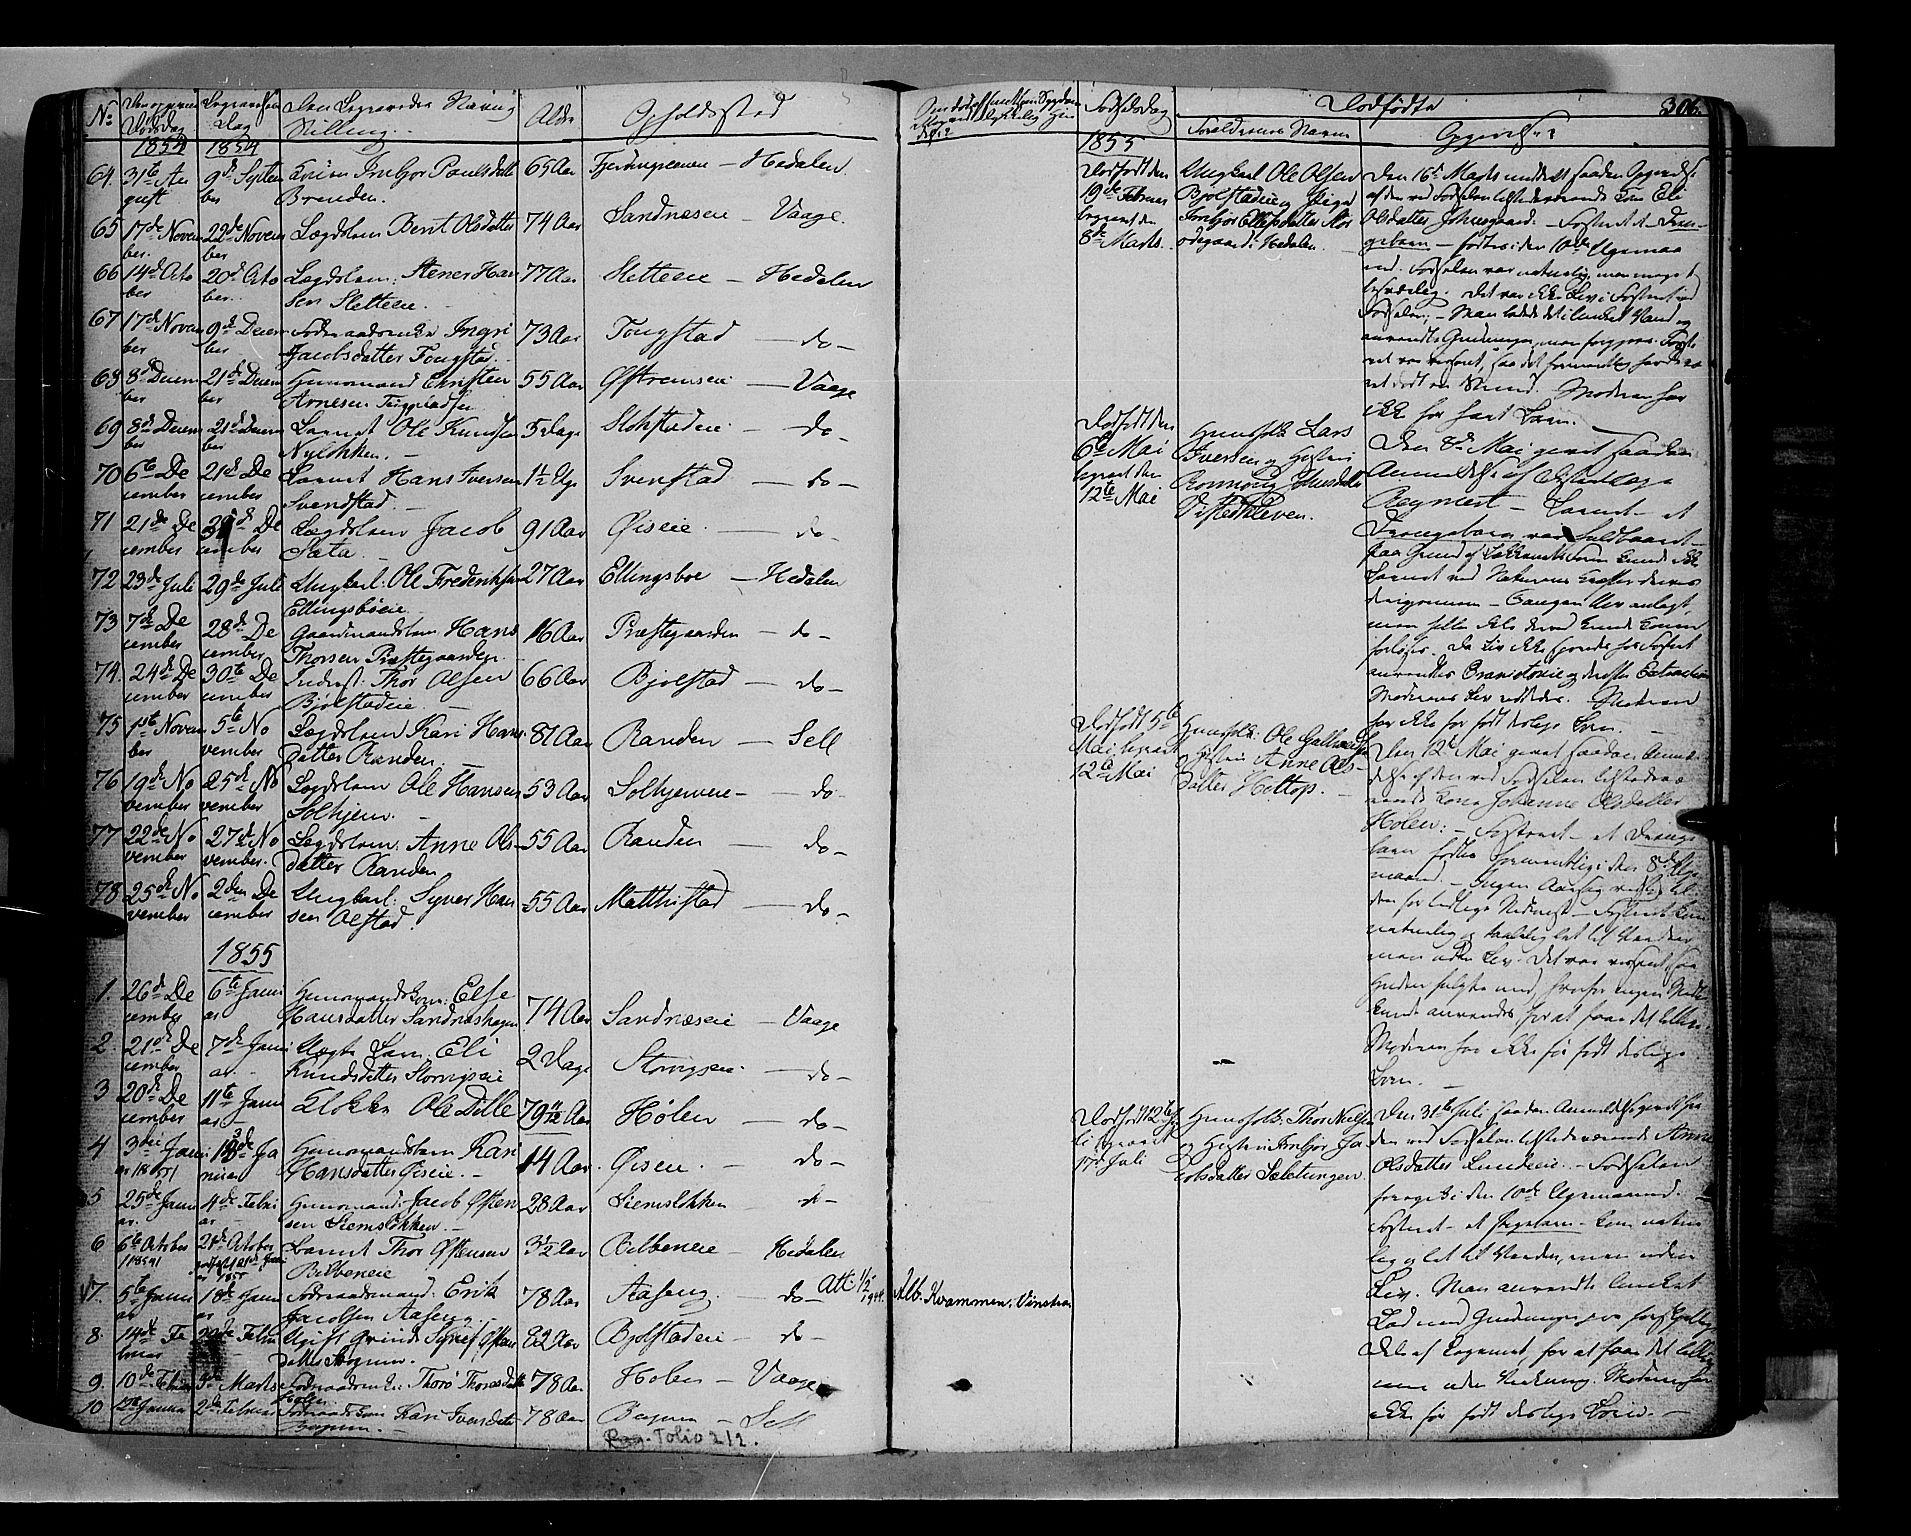 SAH, Vågå prestekontor, Ministerialbok nr. 5 /1, 1842-1856, s. 306